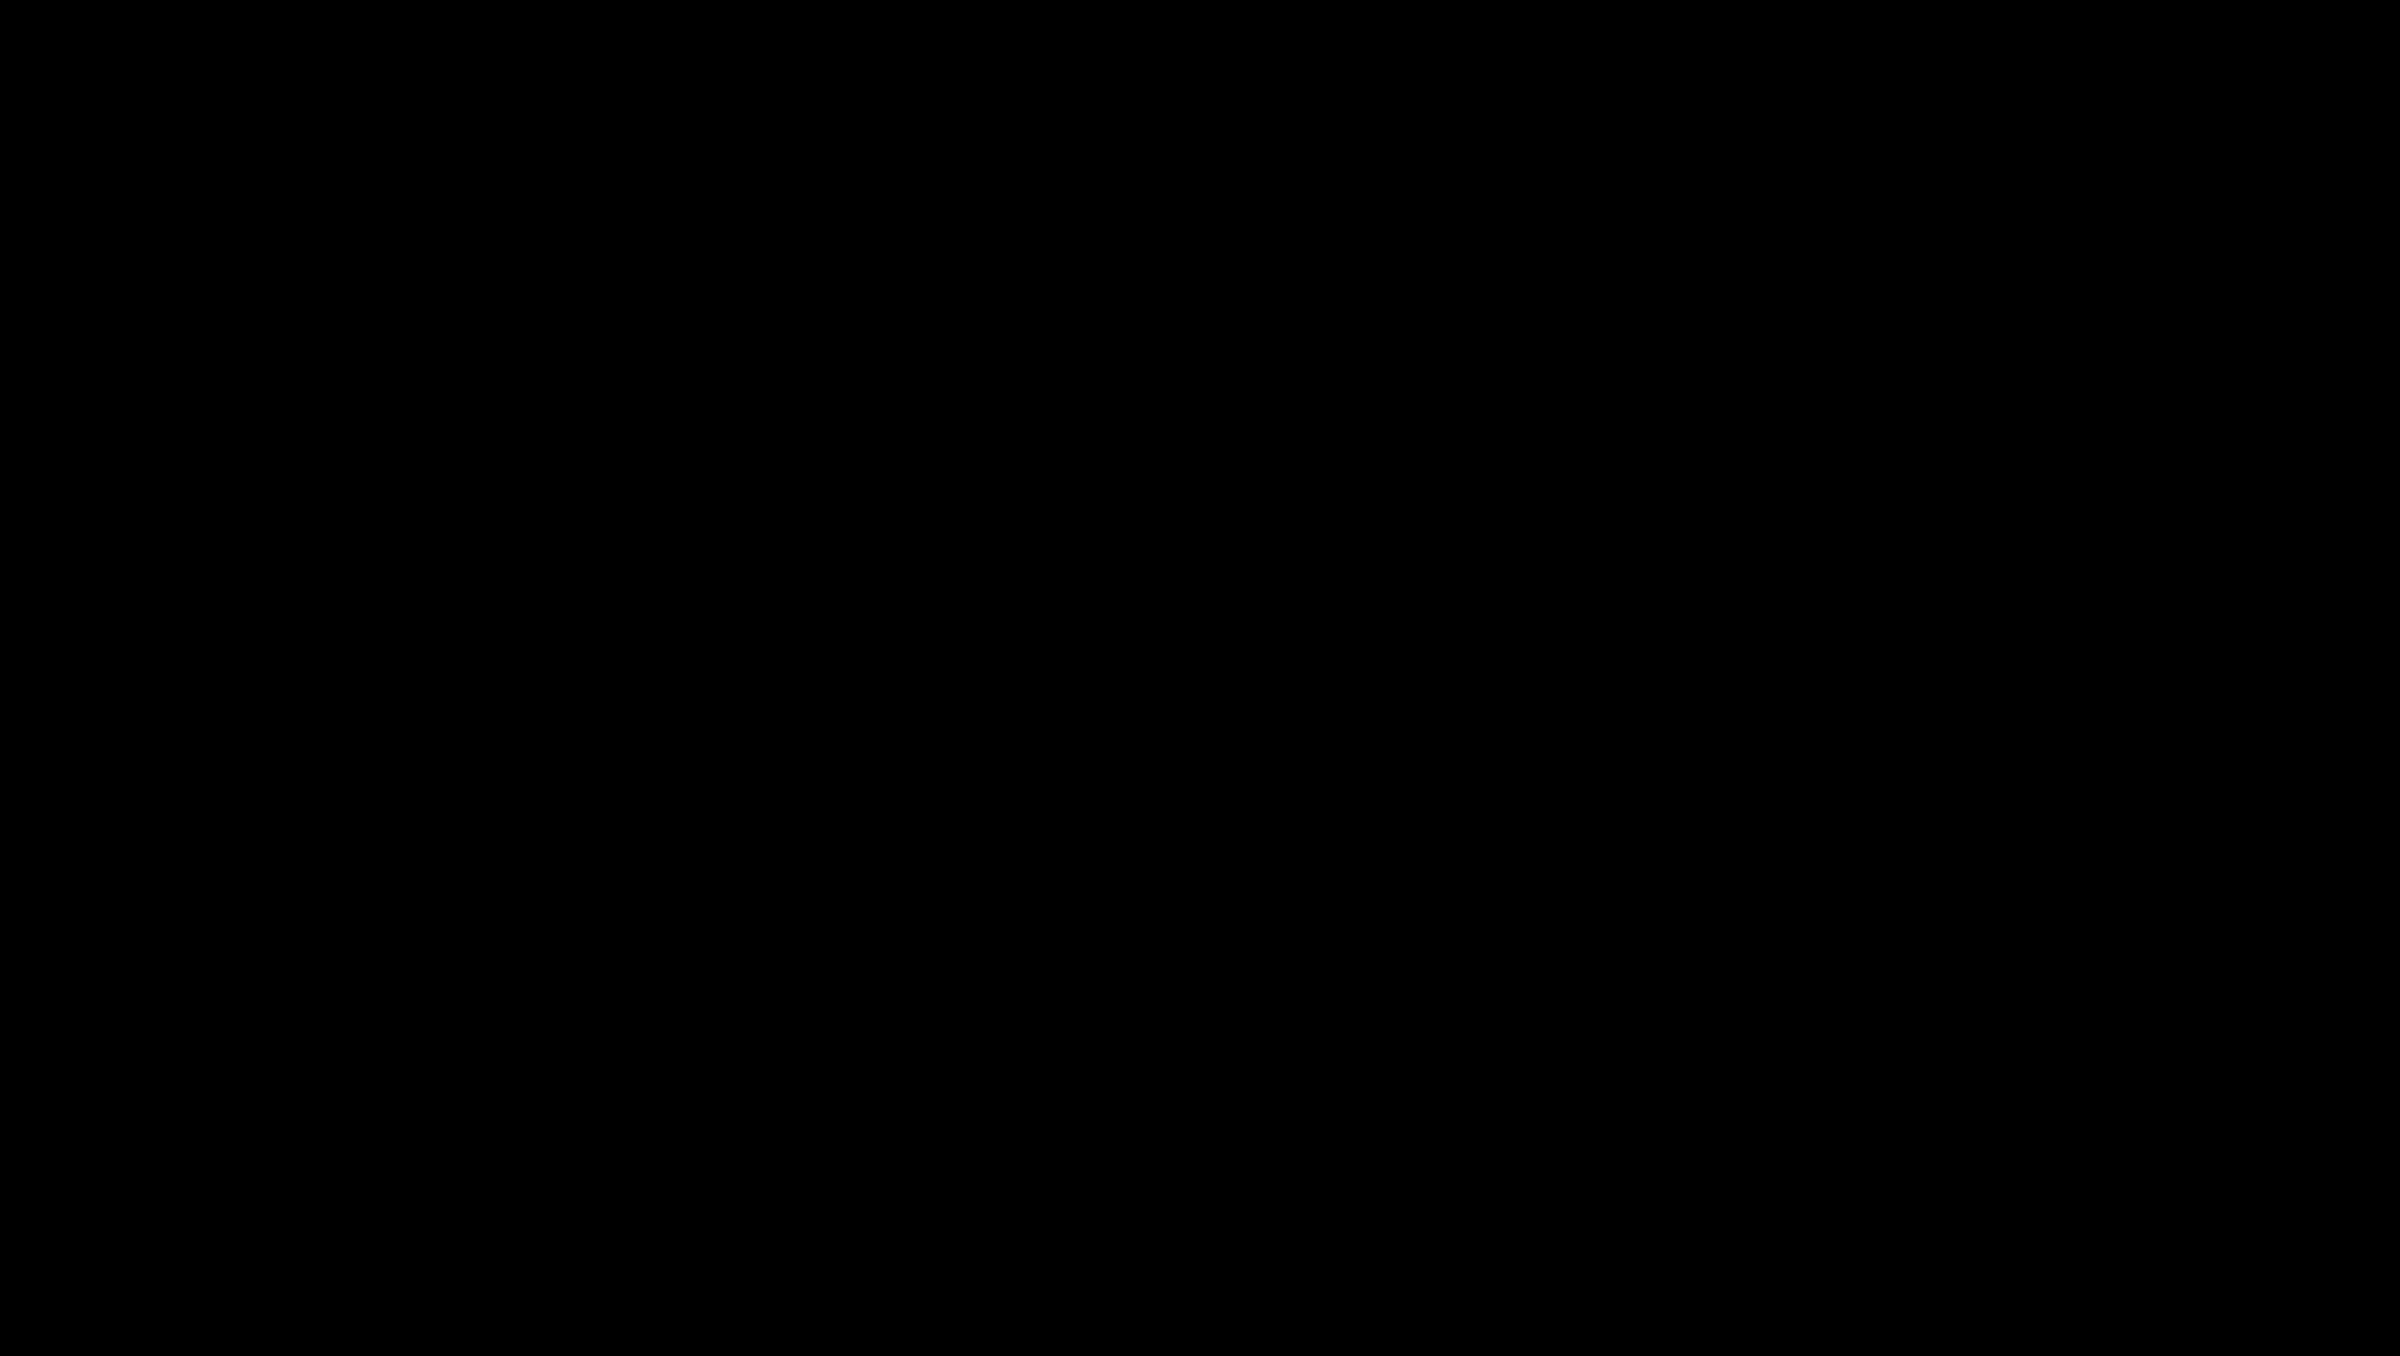 3m logo png transparent amp svg vector freebie supply